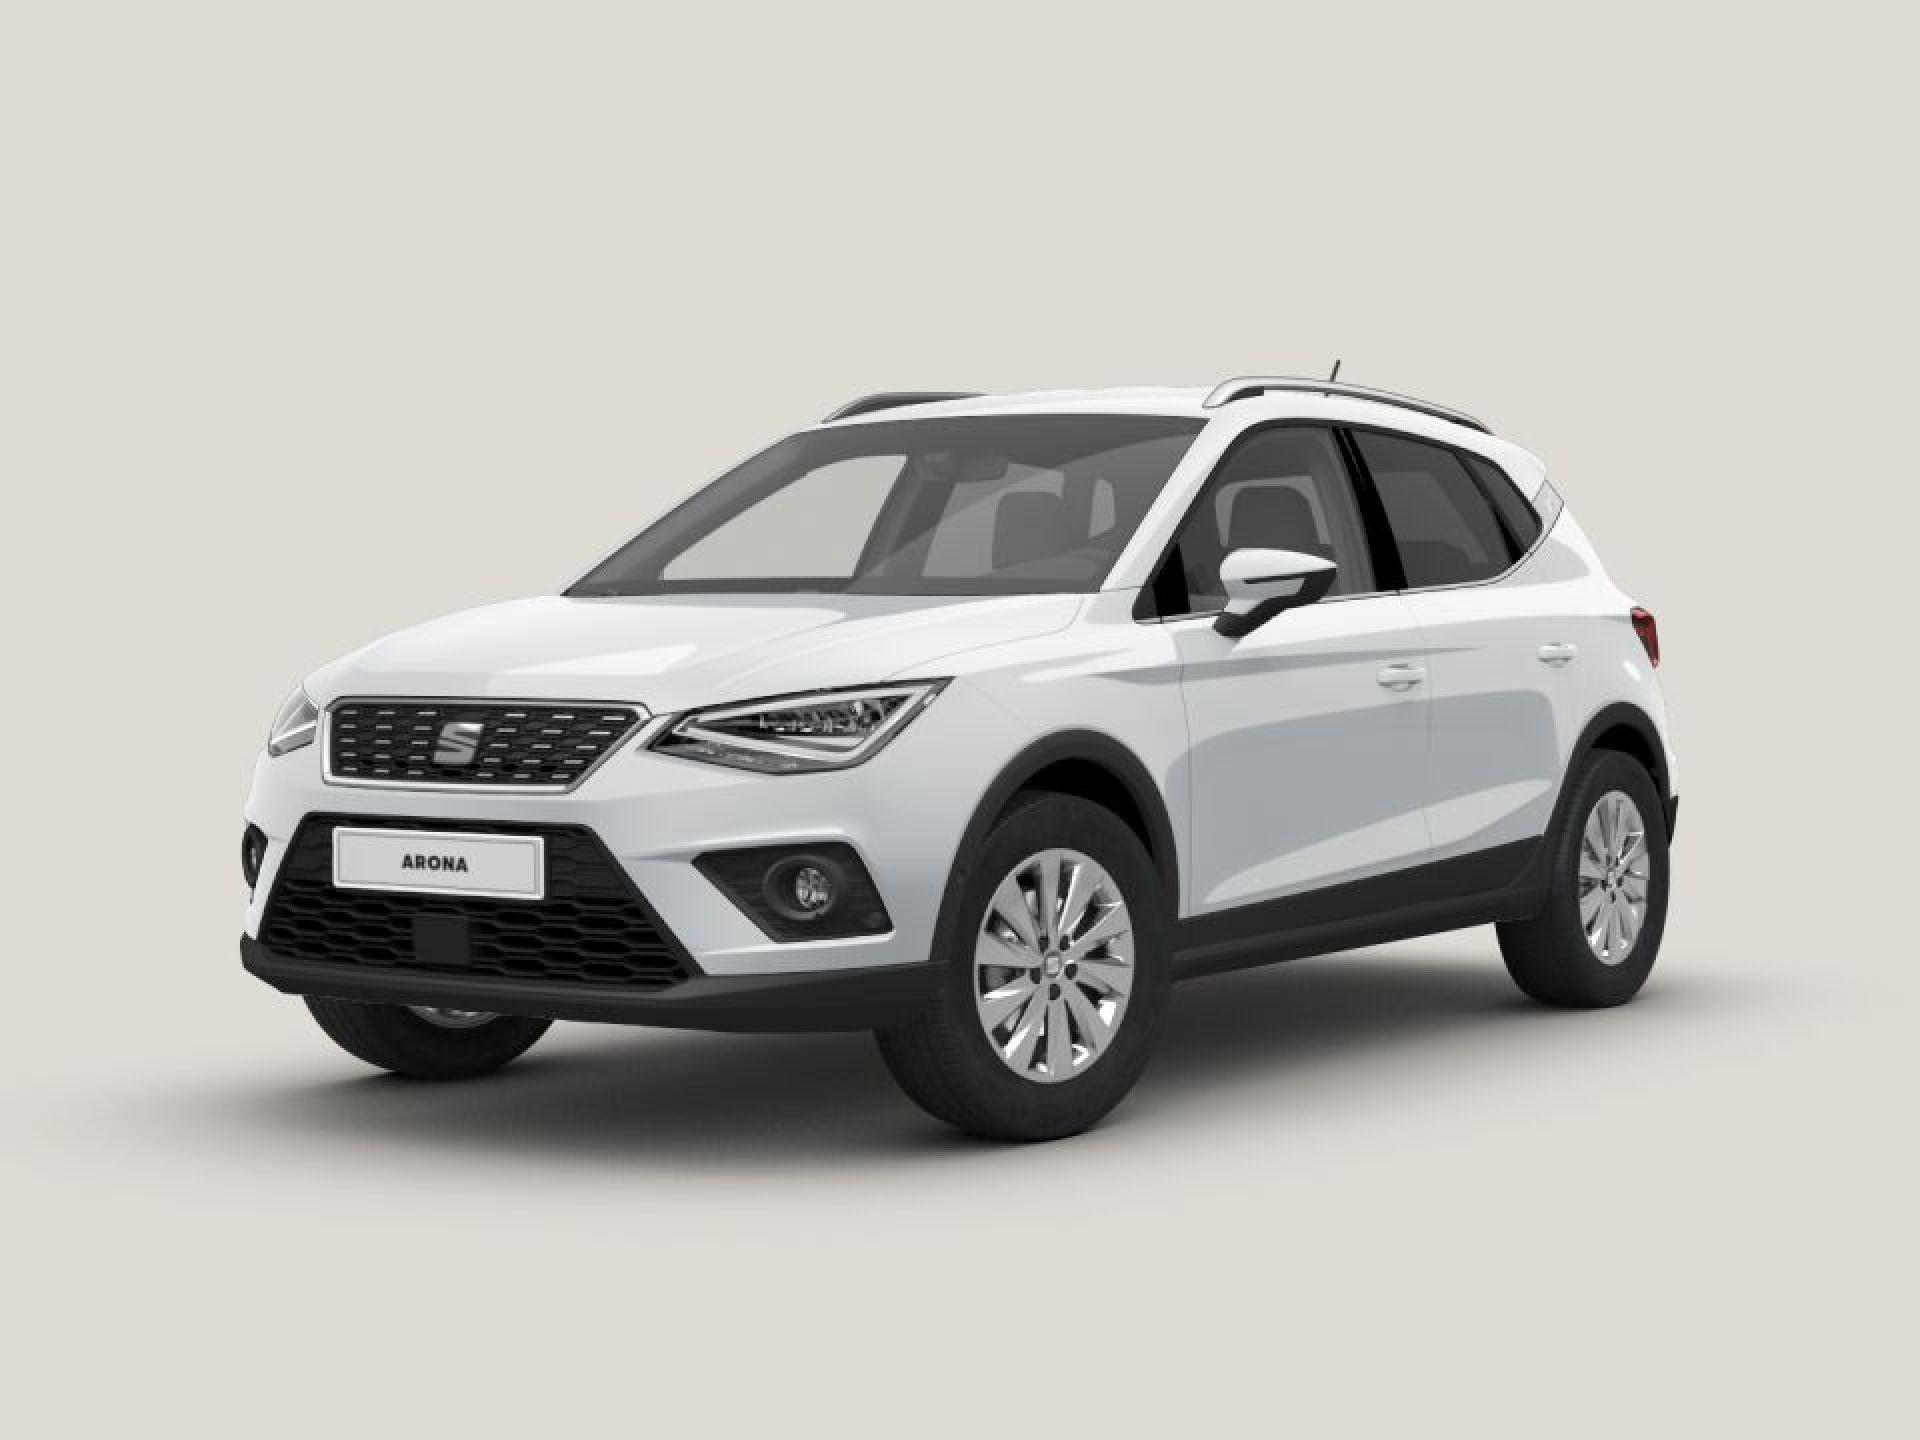 SEAT Arona 1.0 TGI 66kW (90CV) Xcellence Edition nuevo Madrid